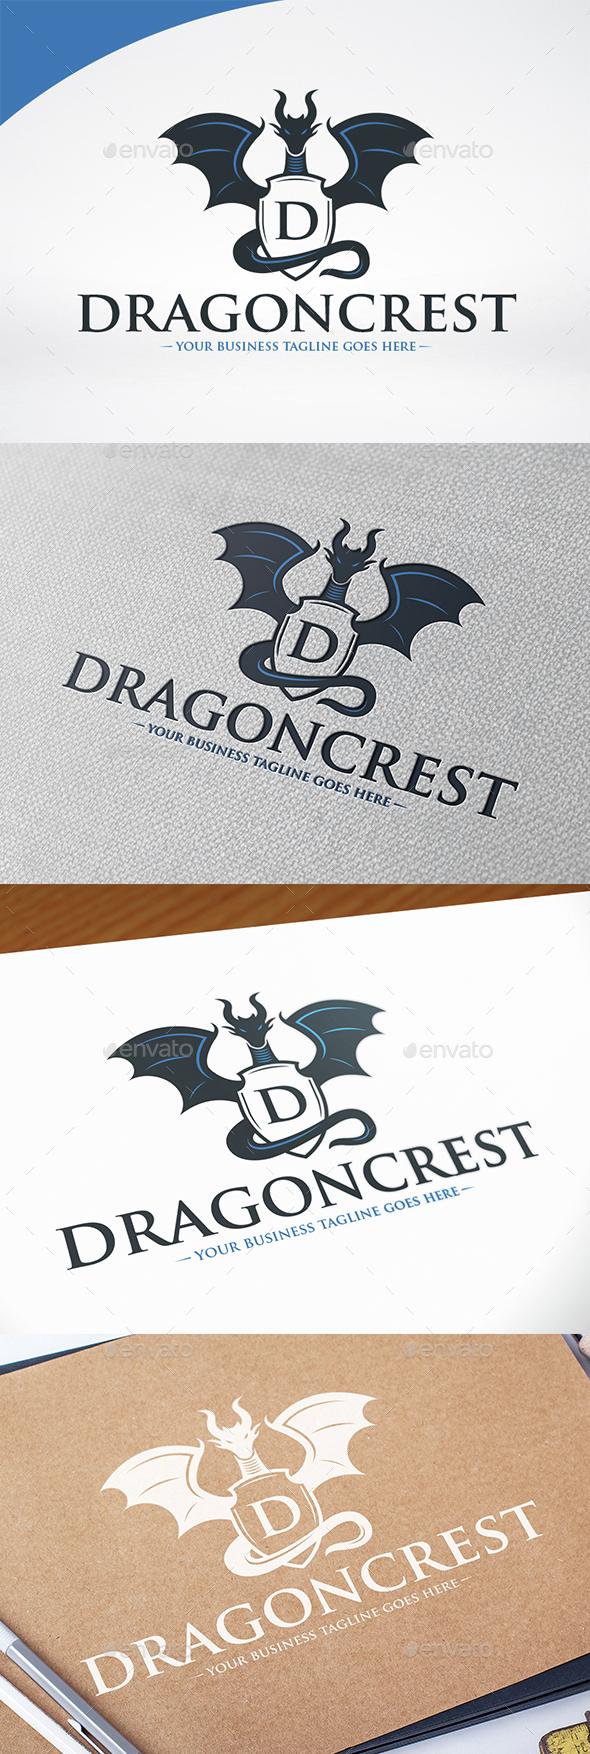 Dragon Crest Logo Template